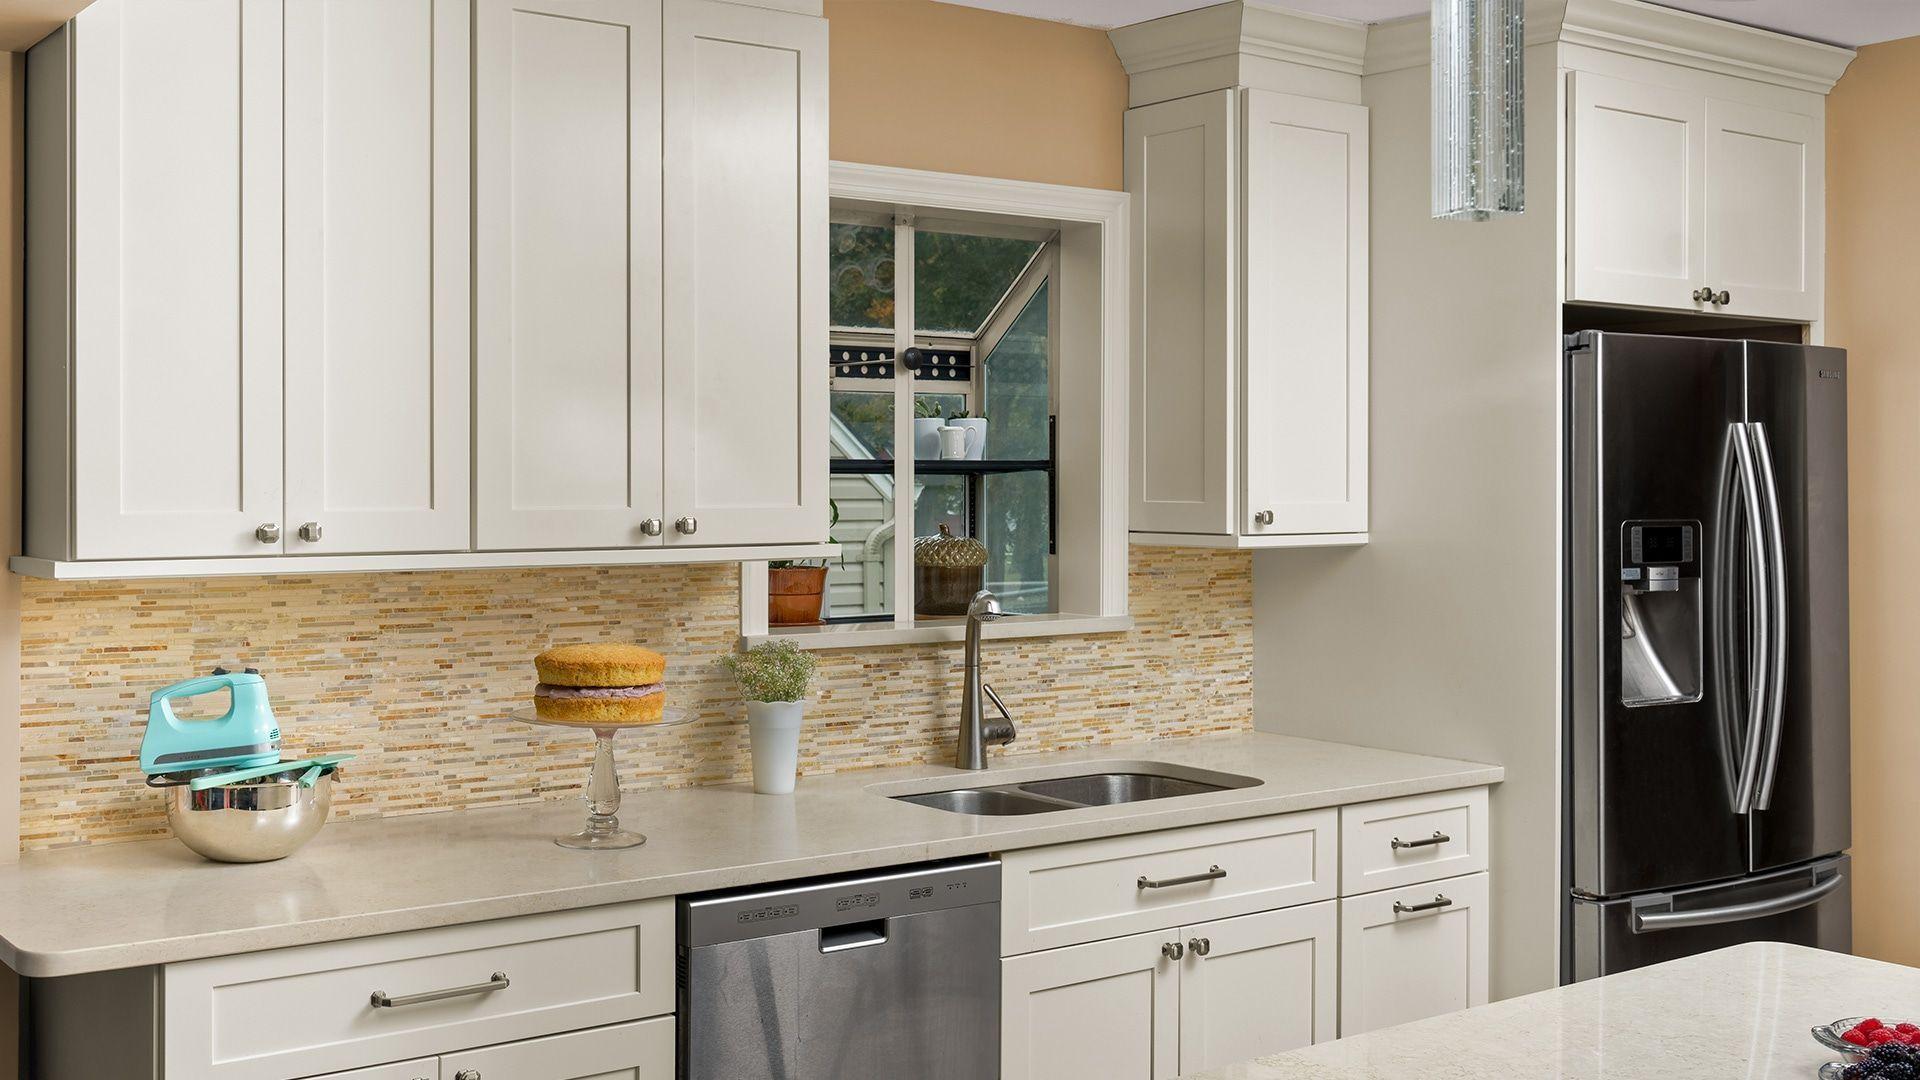 Fabuwood Allure Galaxy Linen Cabinets - Kitchen Cabinets - Kitchen